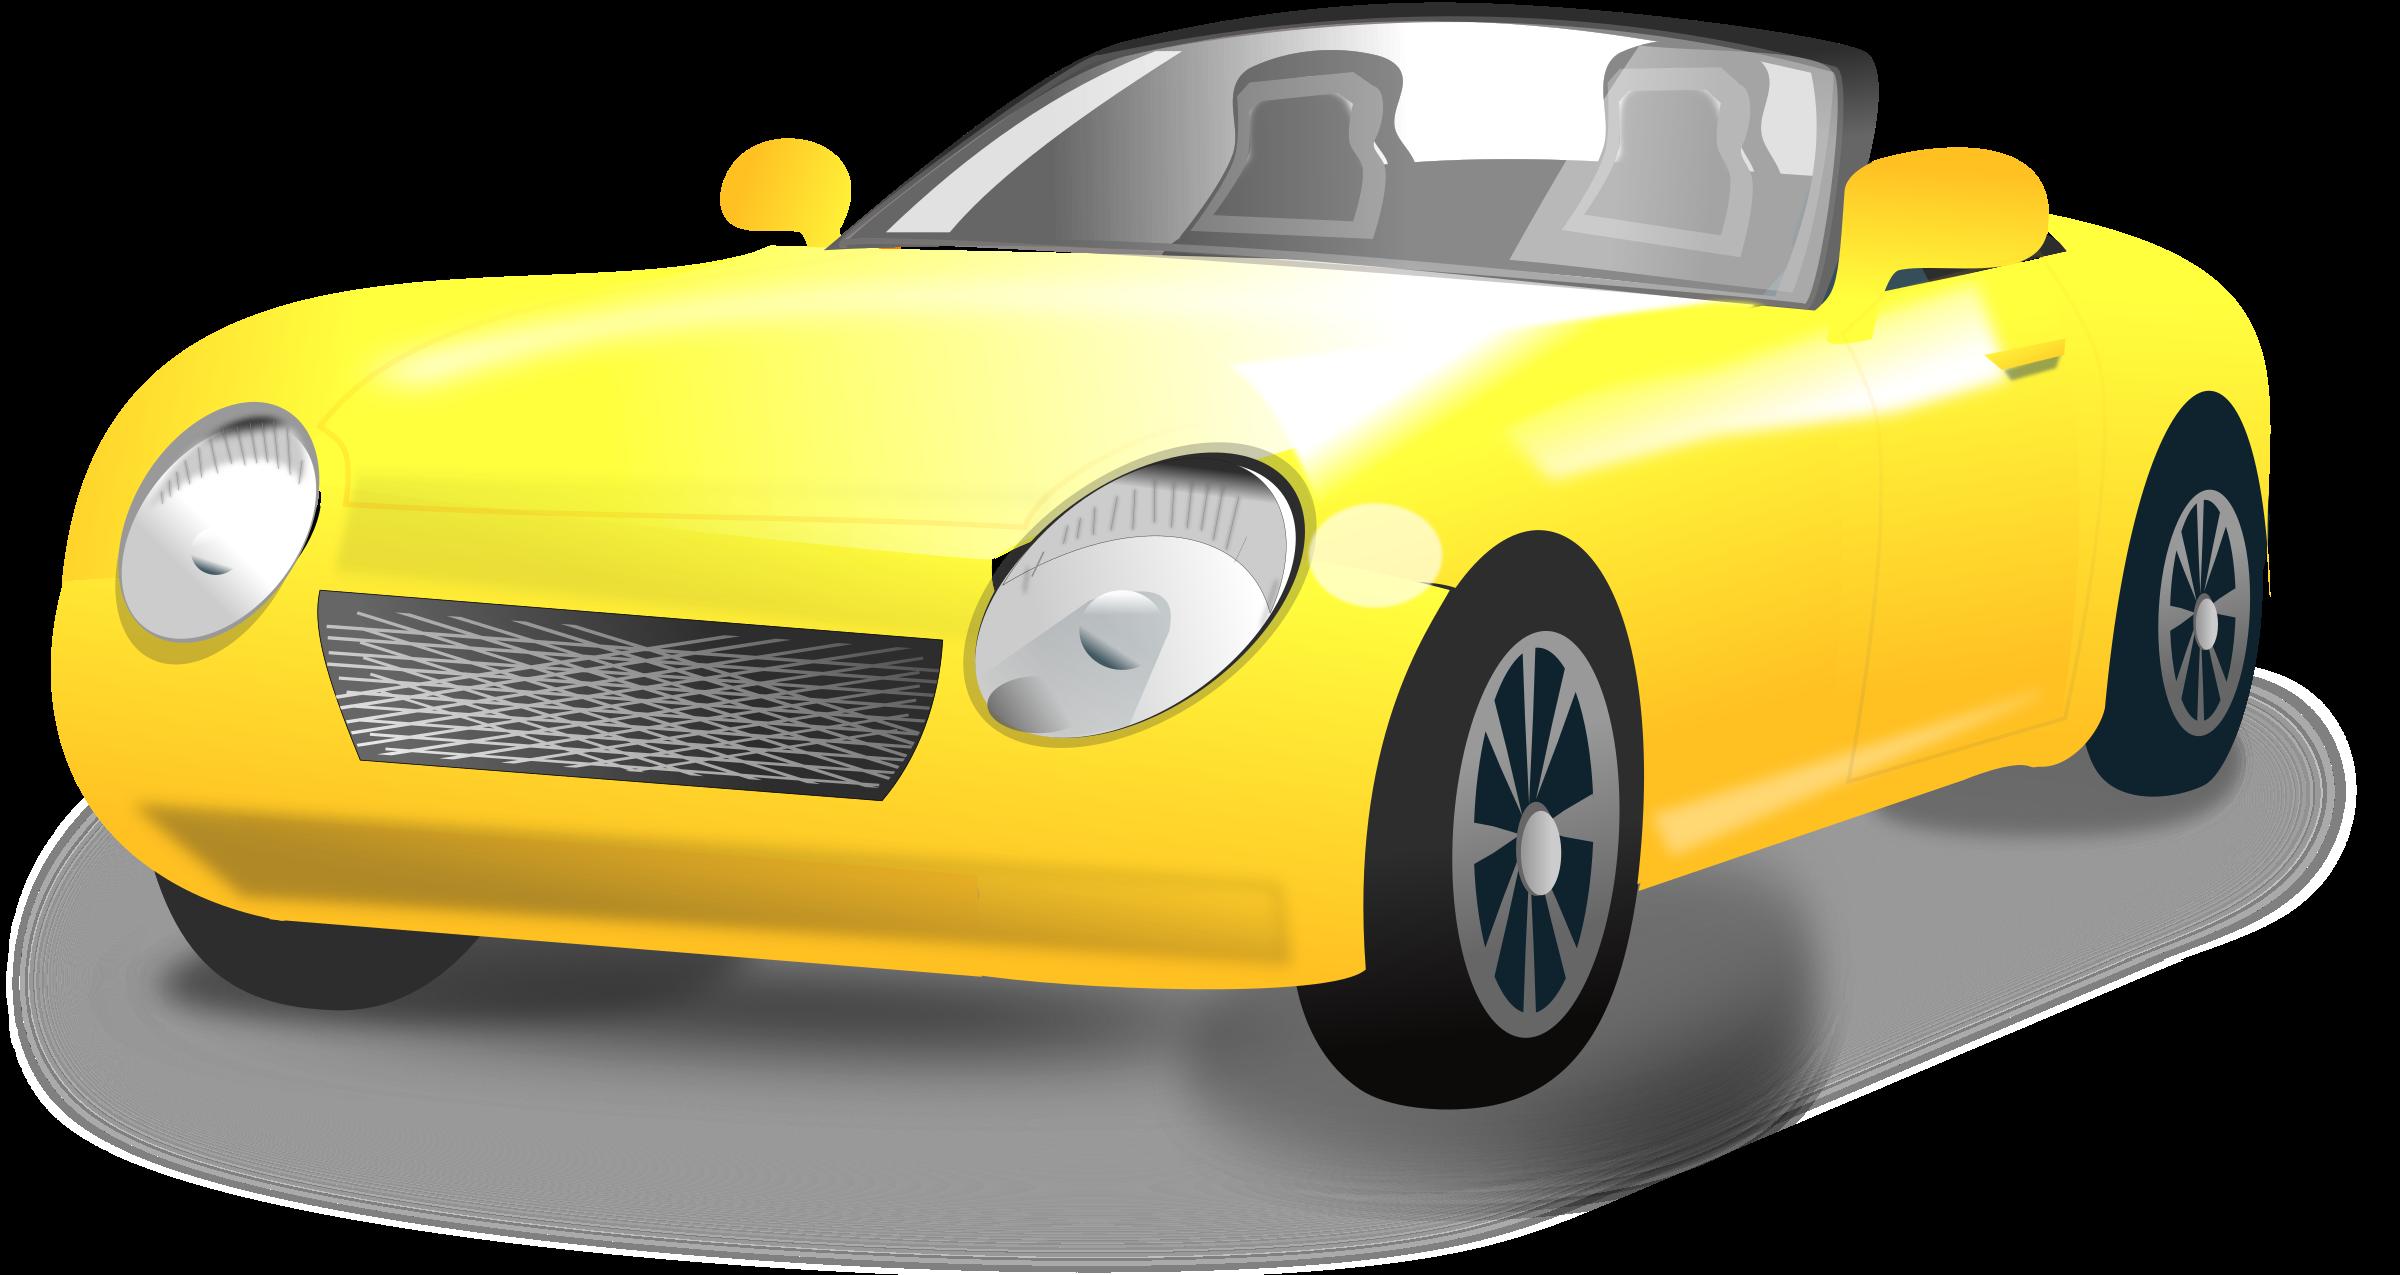 vehicle yellow sports car - photo #23